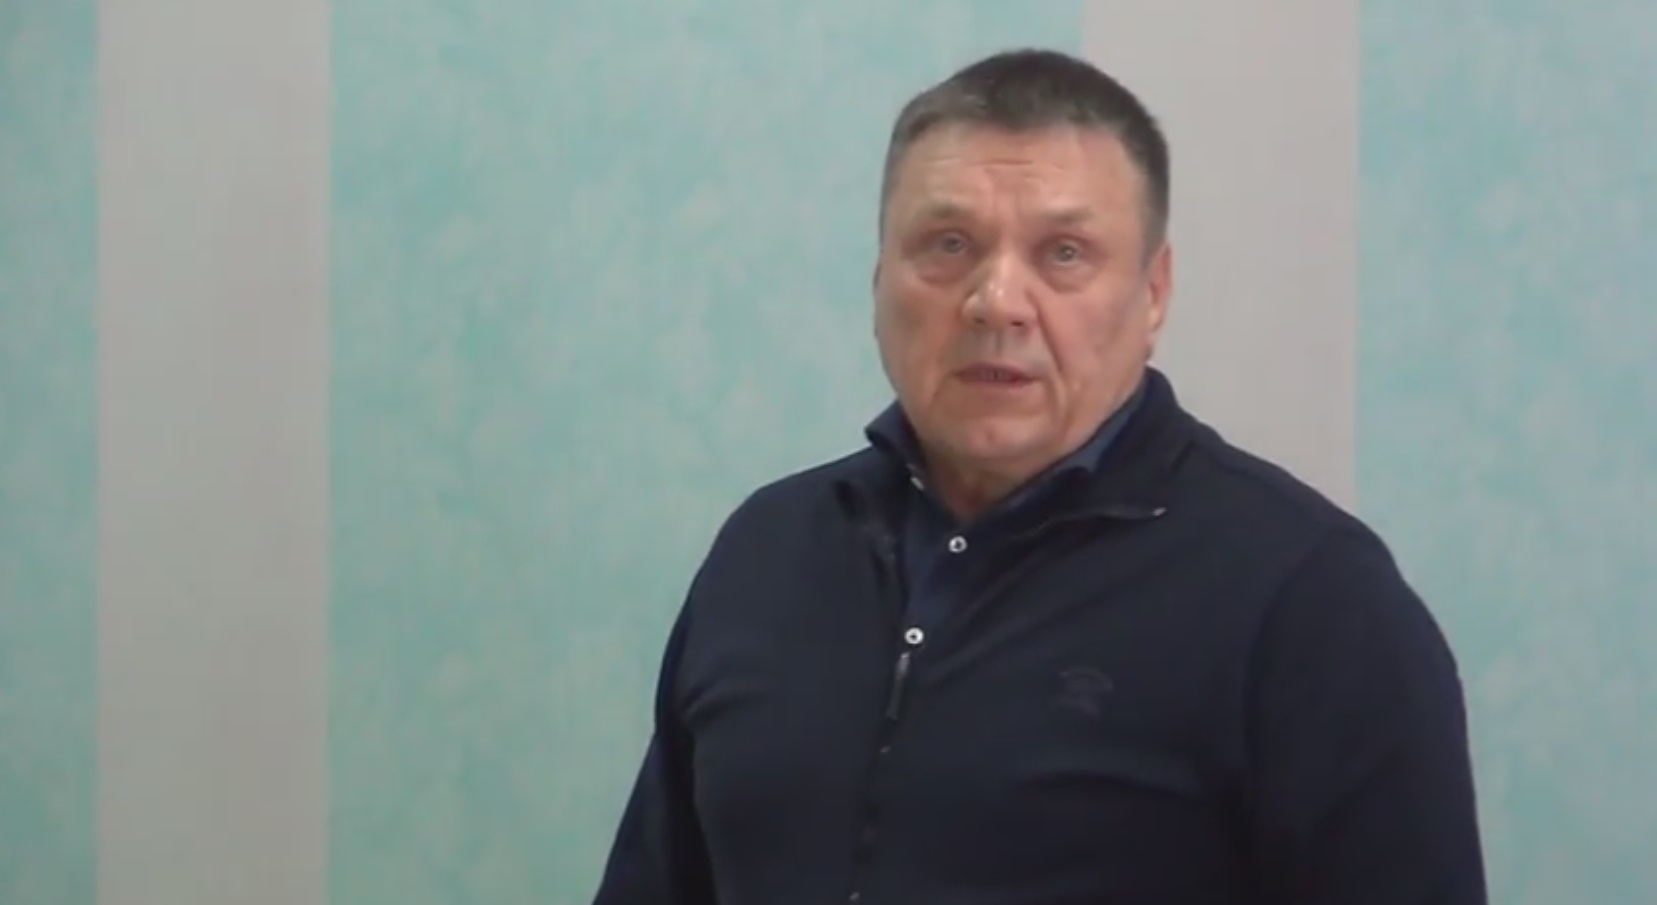 Суд обязал Юрия Мовшина выплатить потерпевшим 8 млн руб.